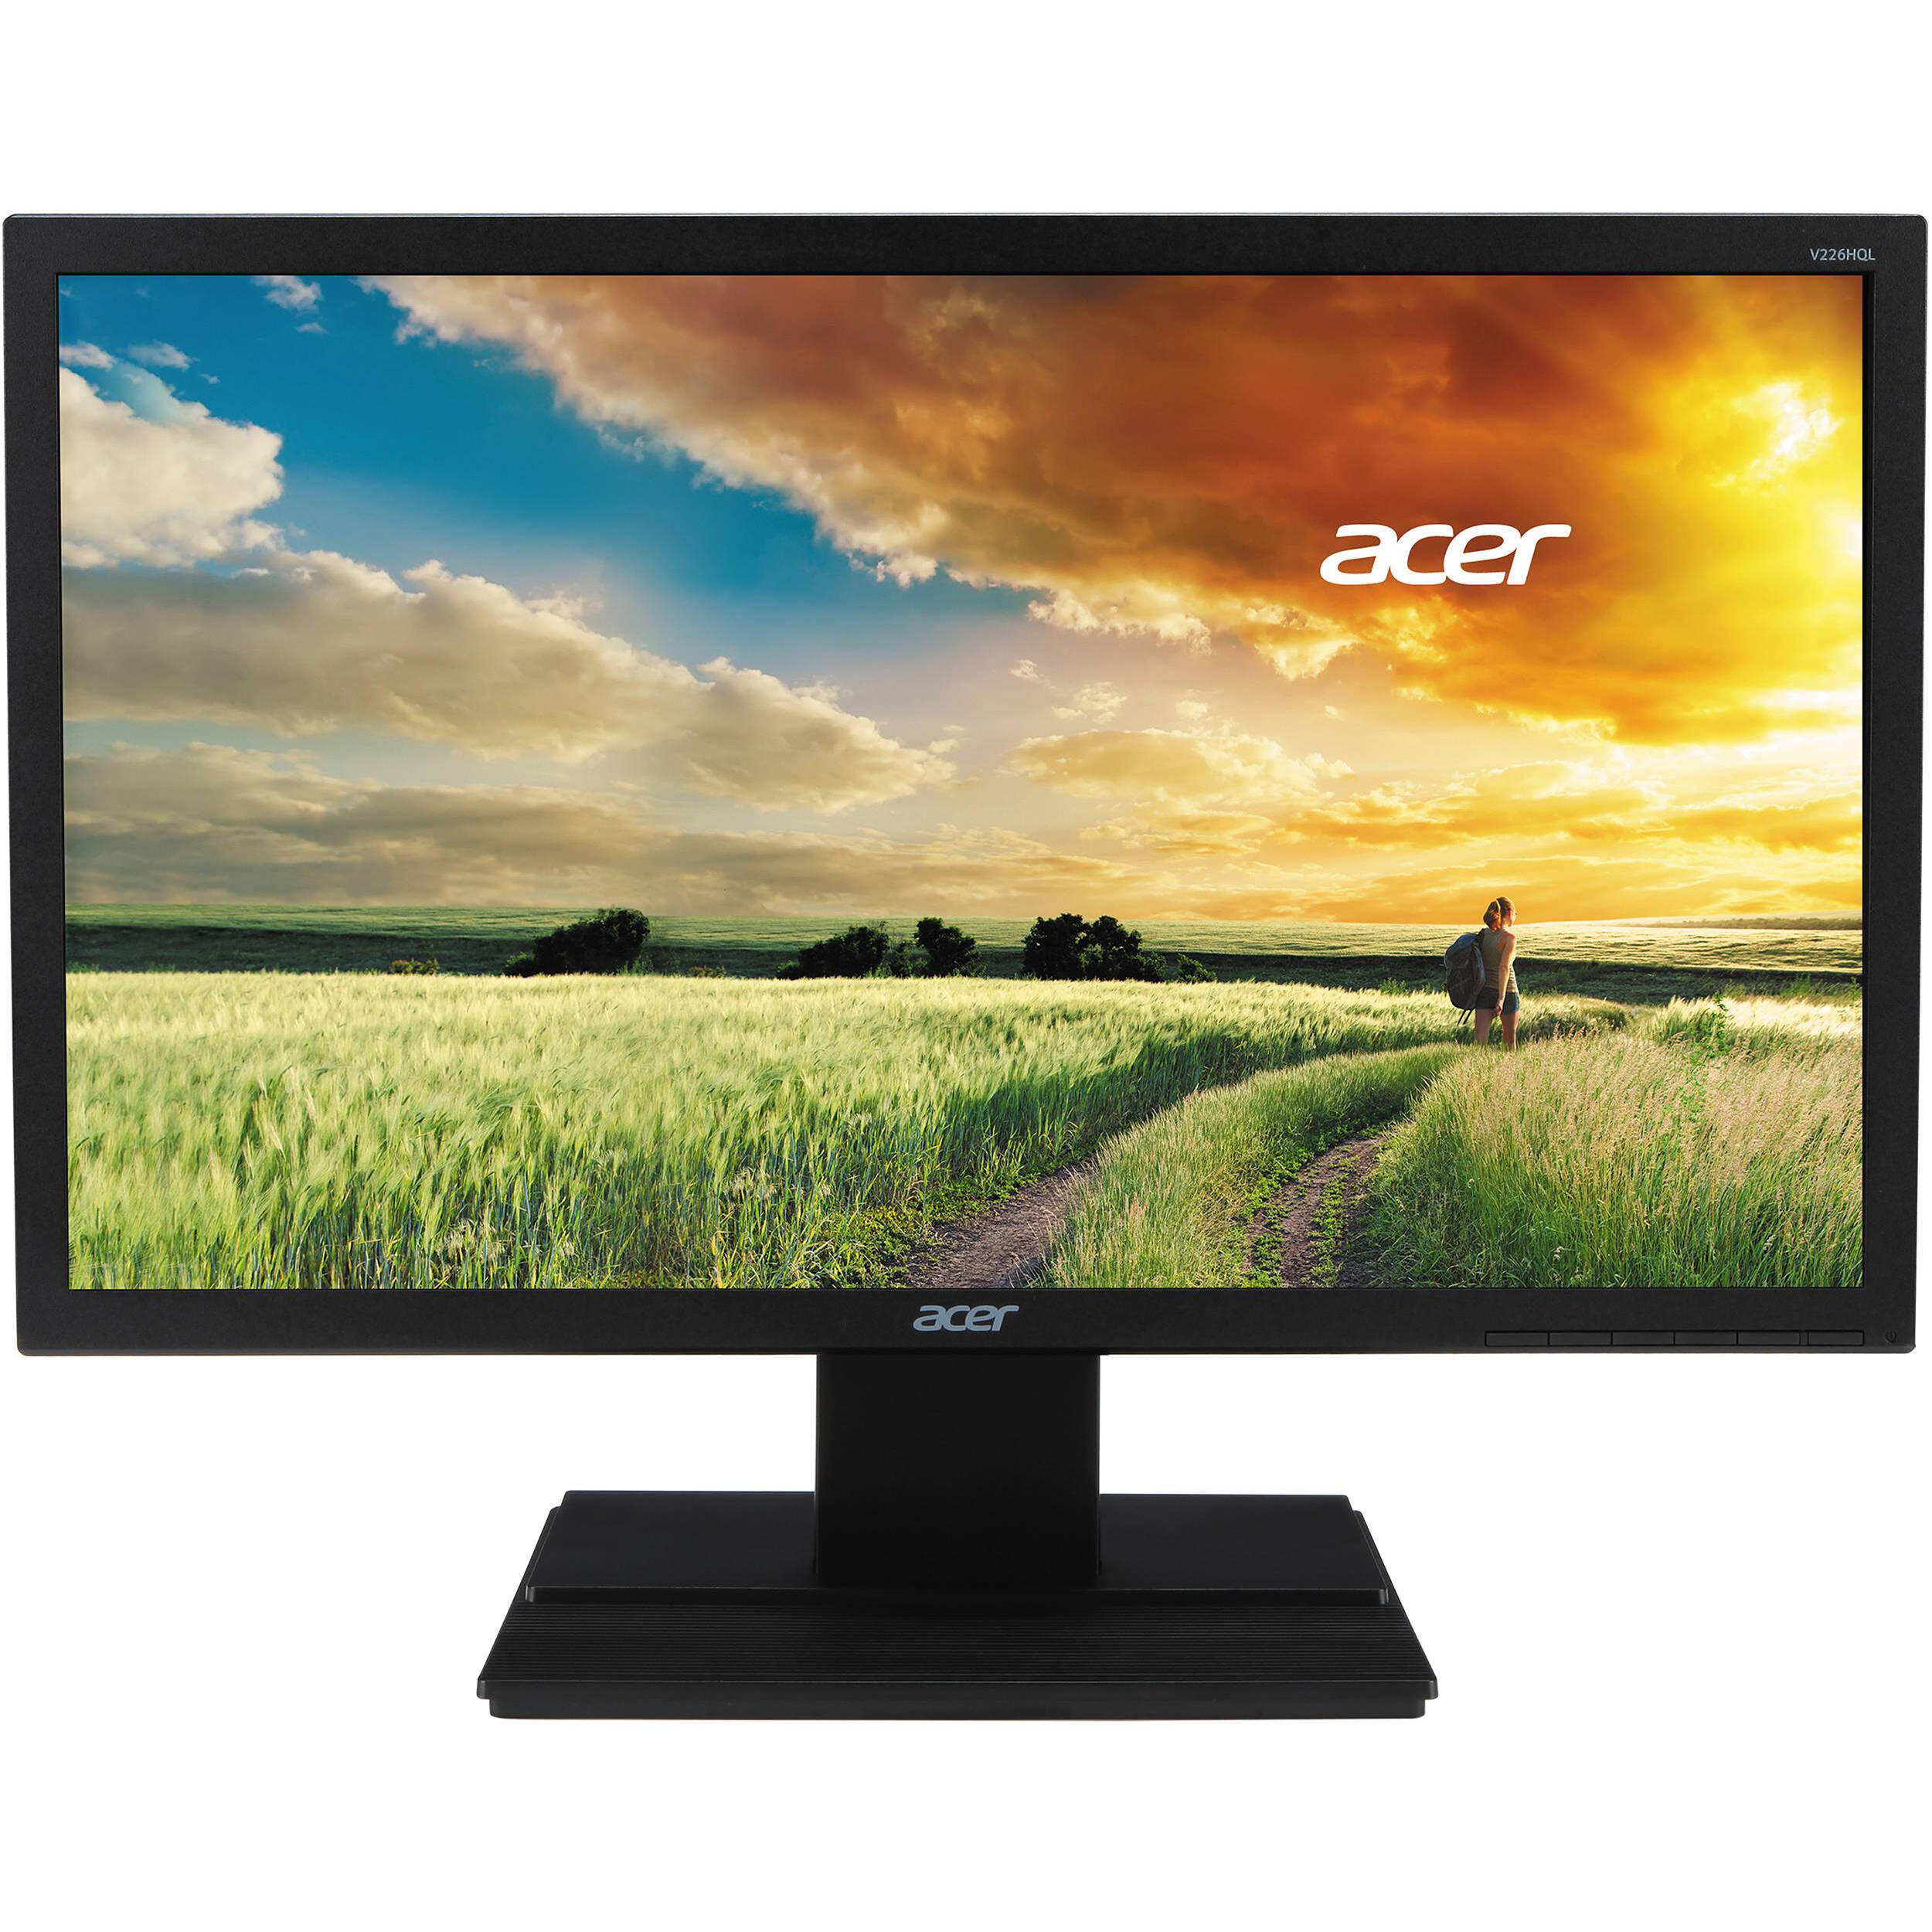 Acer V226HQL 21.5-inch Full HD LED LCD Monitor